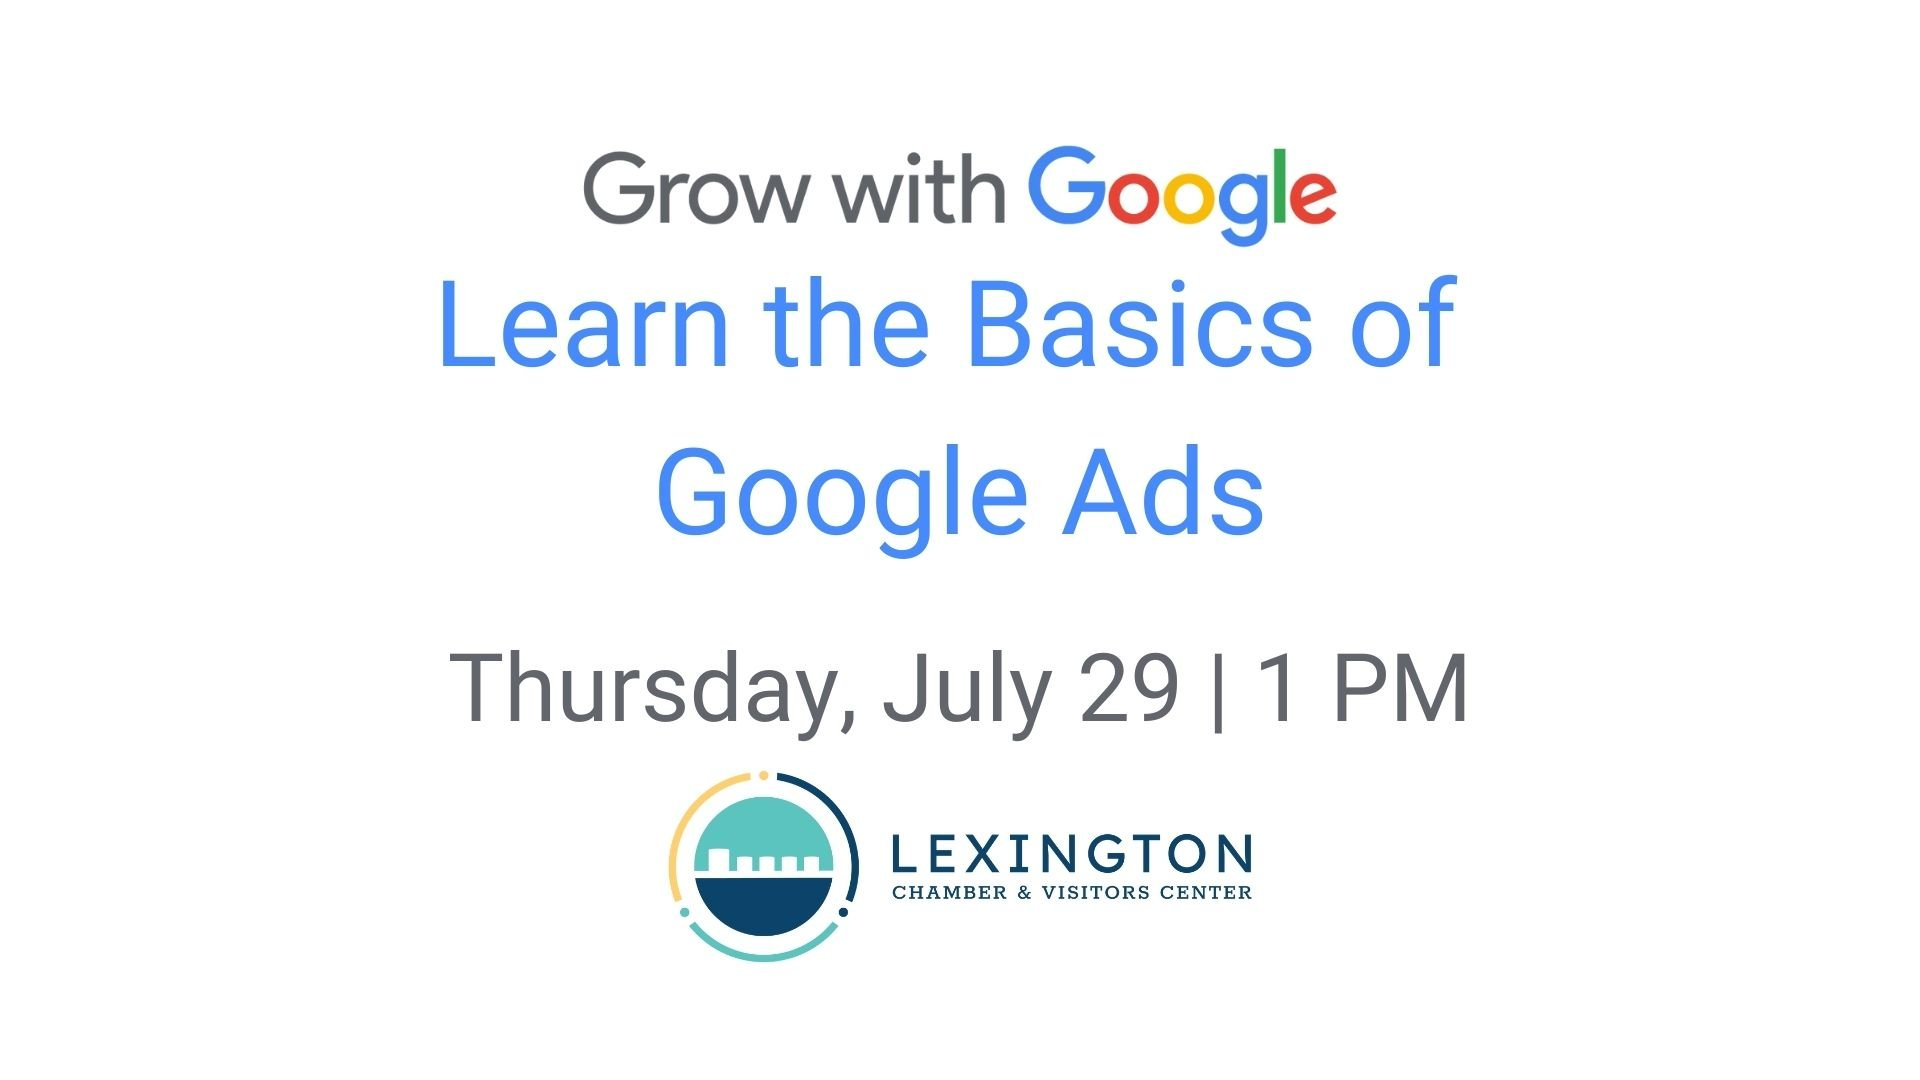 Google Training: Learn the Basics of Google Ads Photo 1